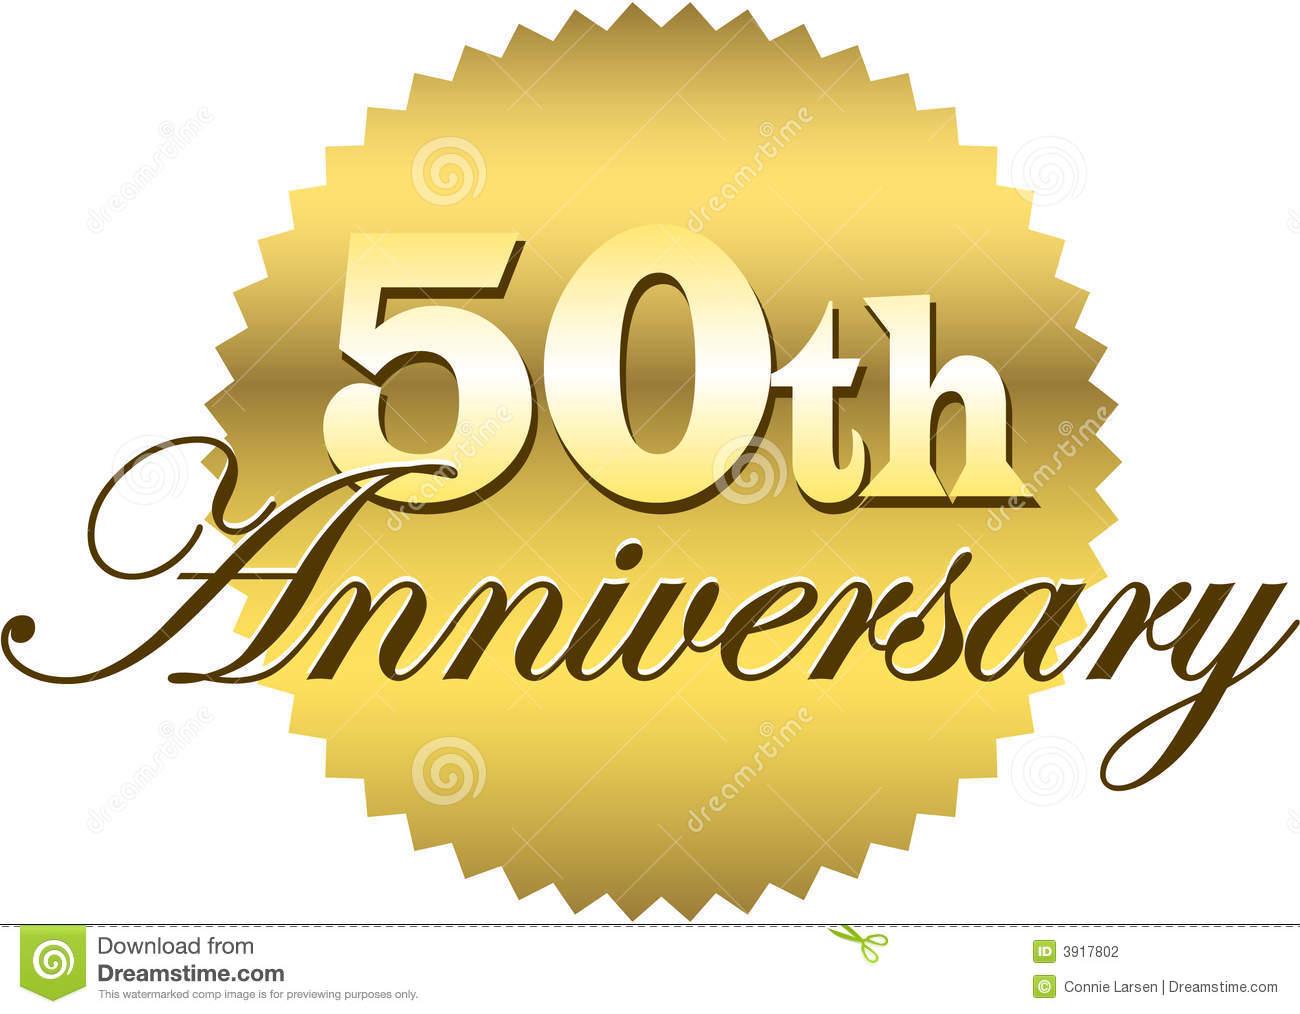 Golden Wedding Anniversary Clipart - Clipart Suggest